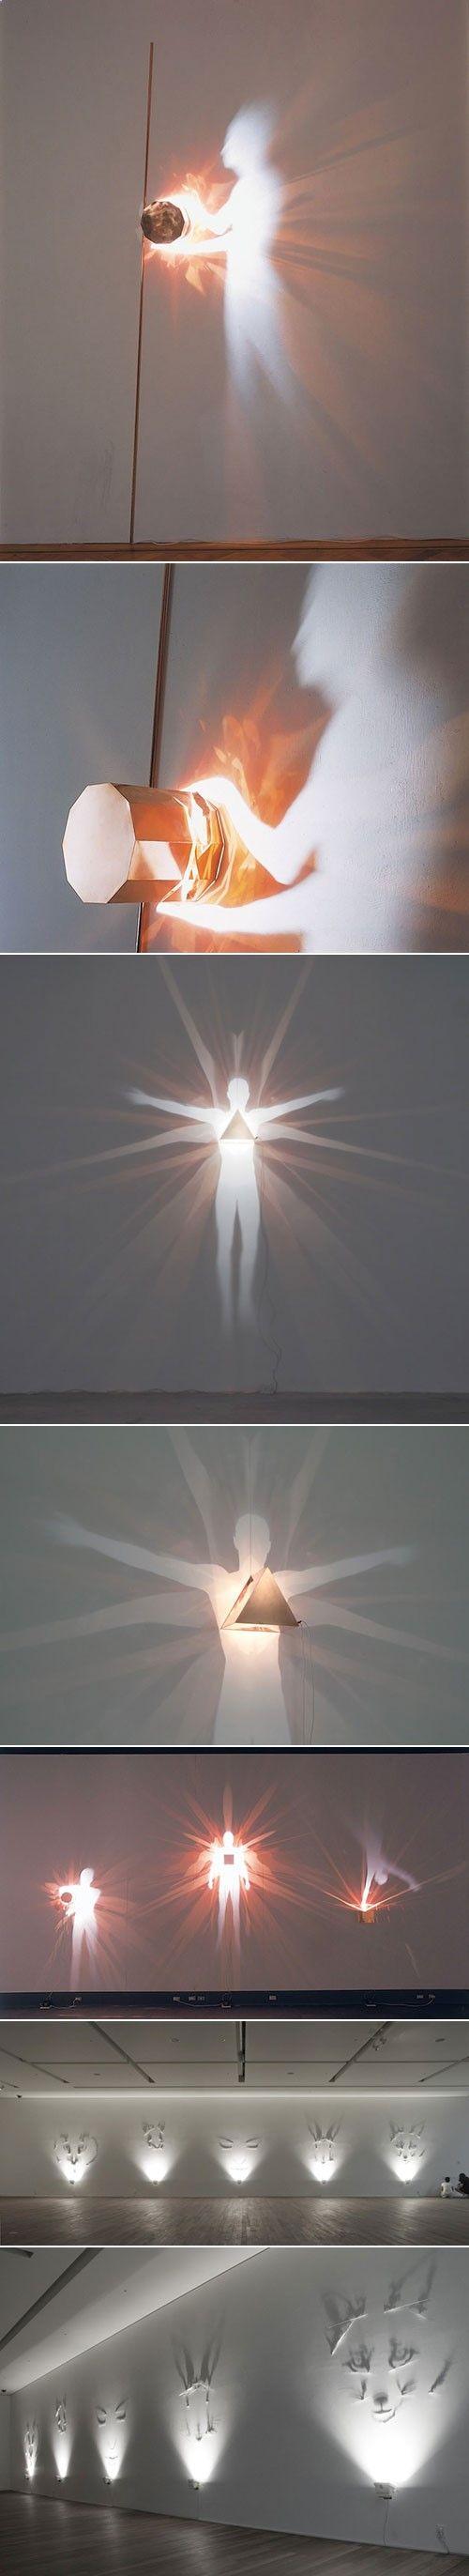 Incredible shadow art by Fabrizio Corneli.